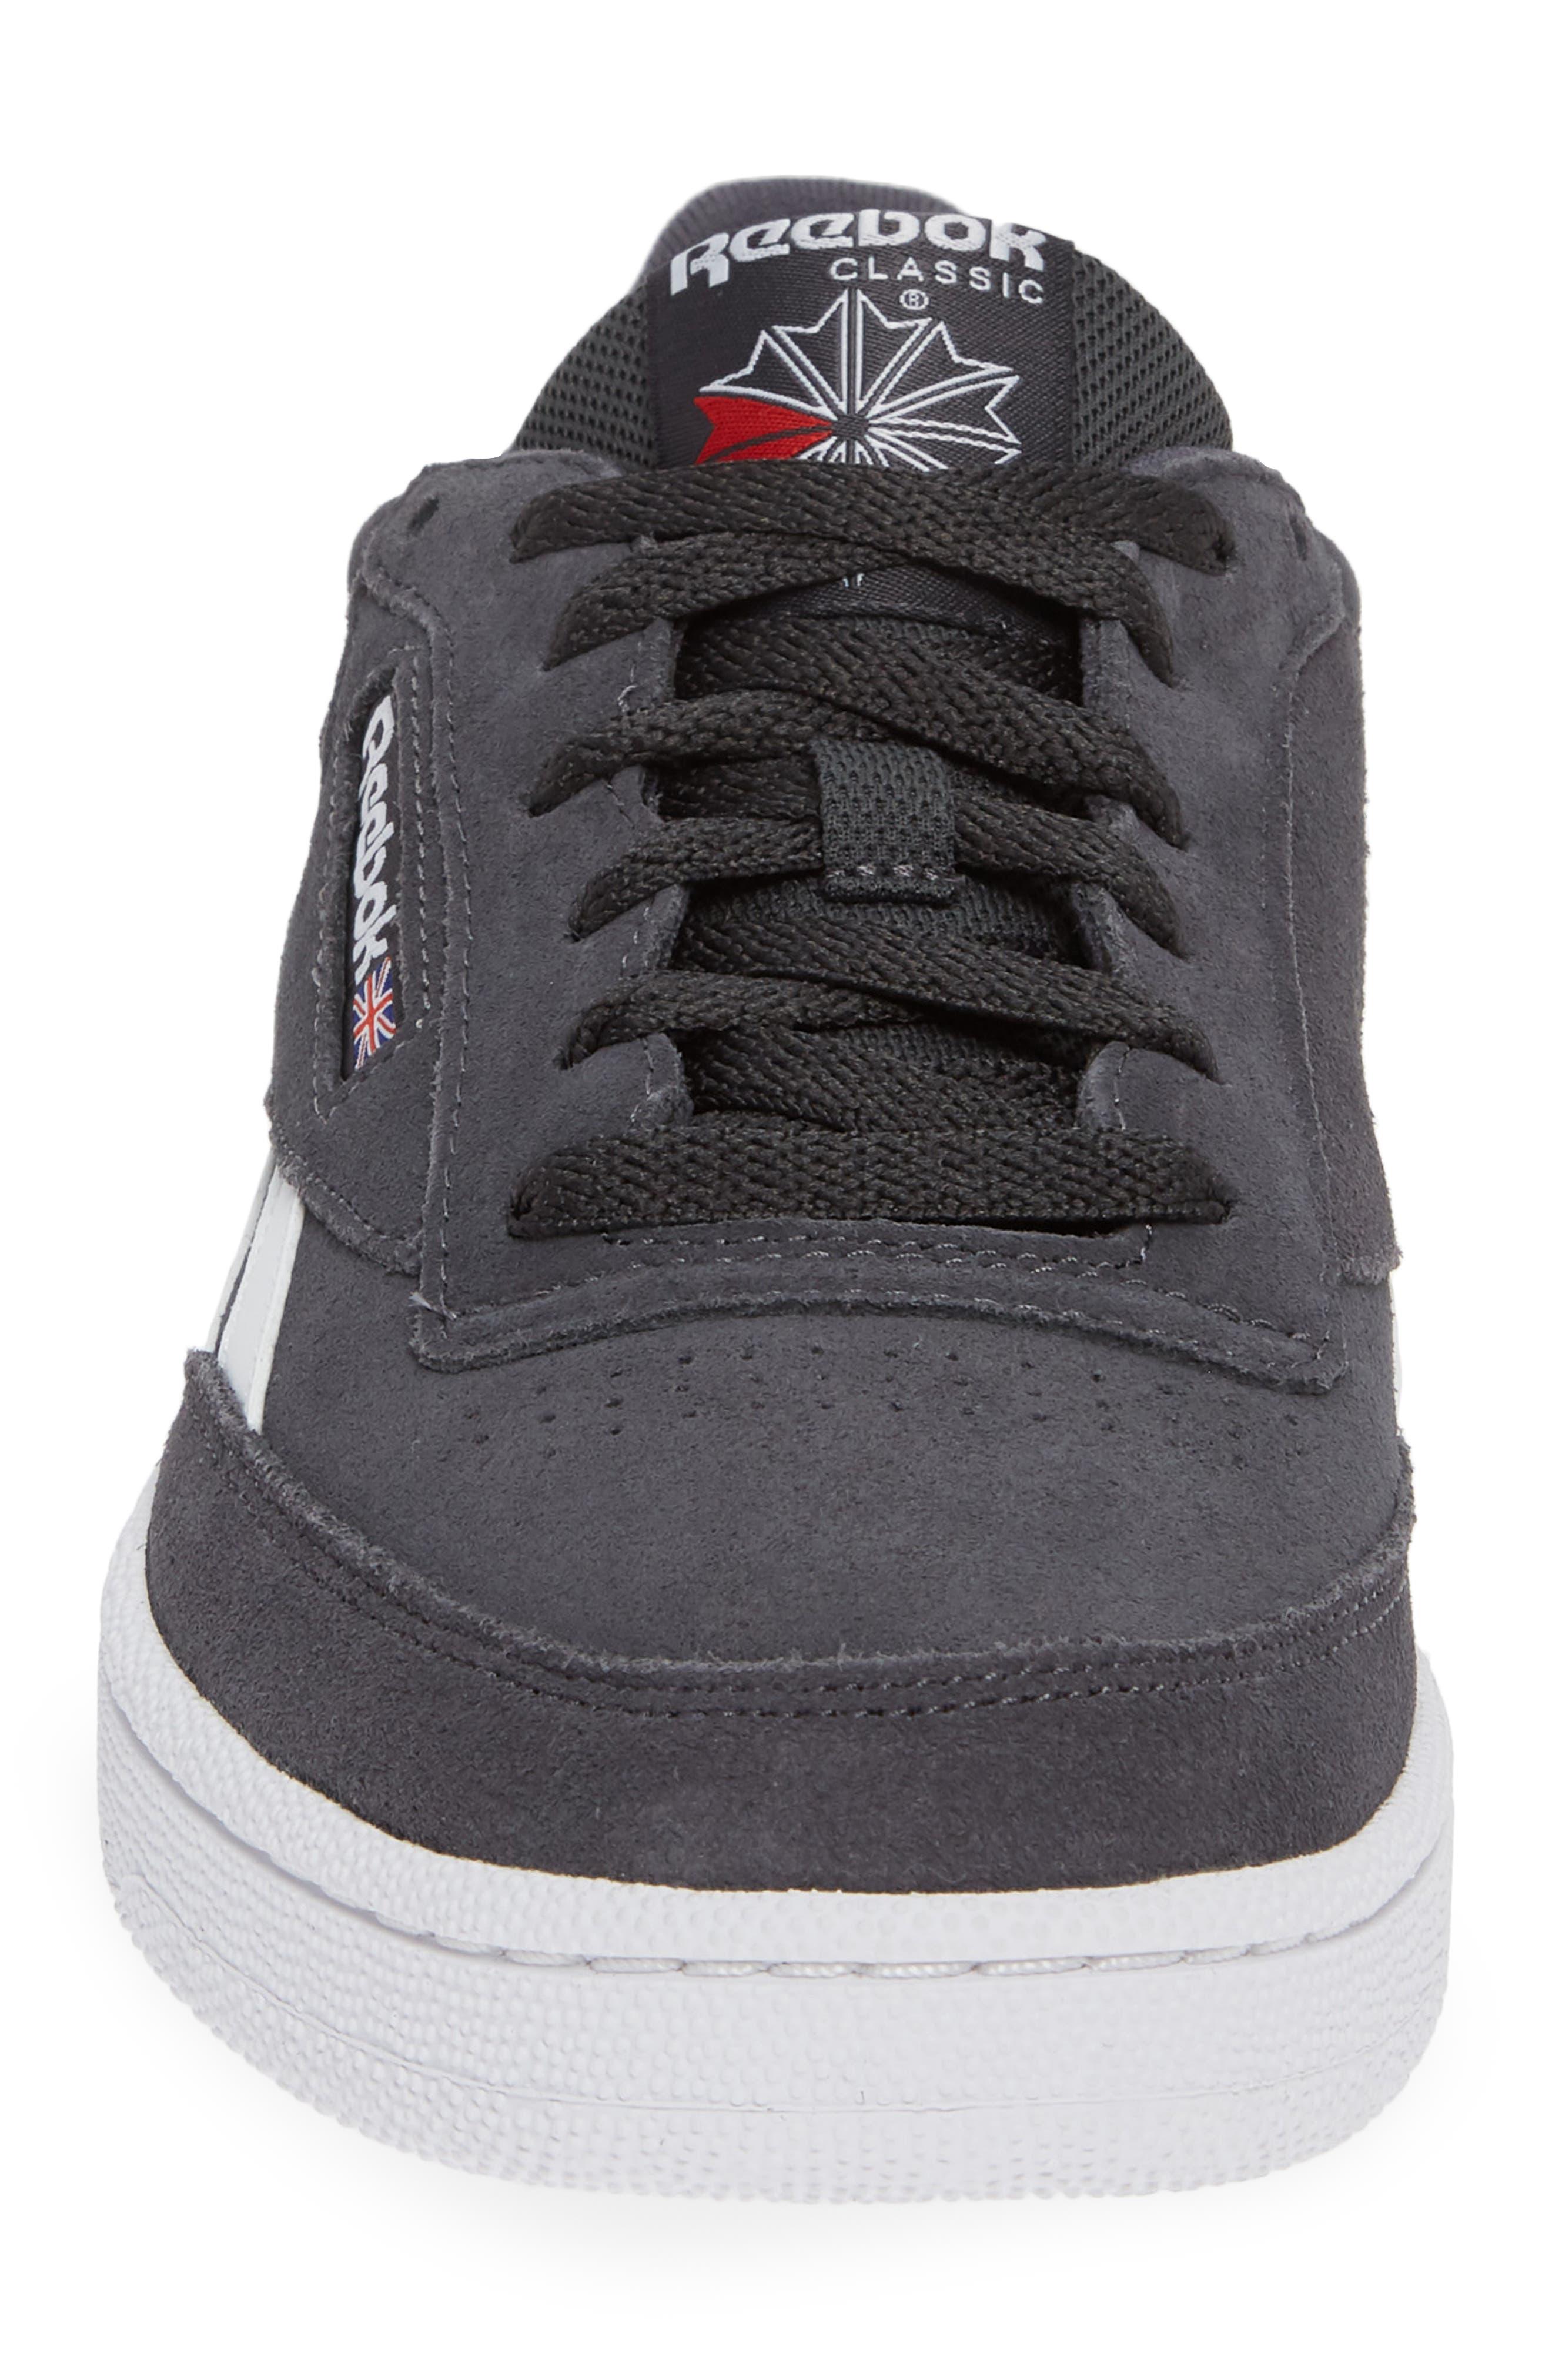 Revenge Plus ESTL Sneaker,                             Alternate thumbnail 4, color,                             BLUE/ COAL/ WHITE